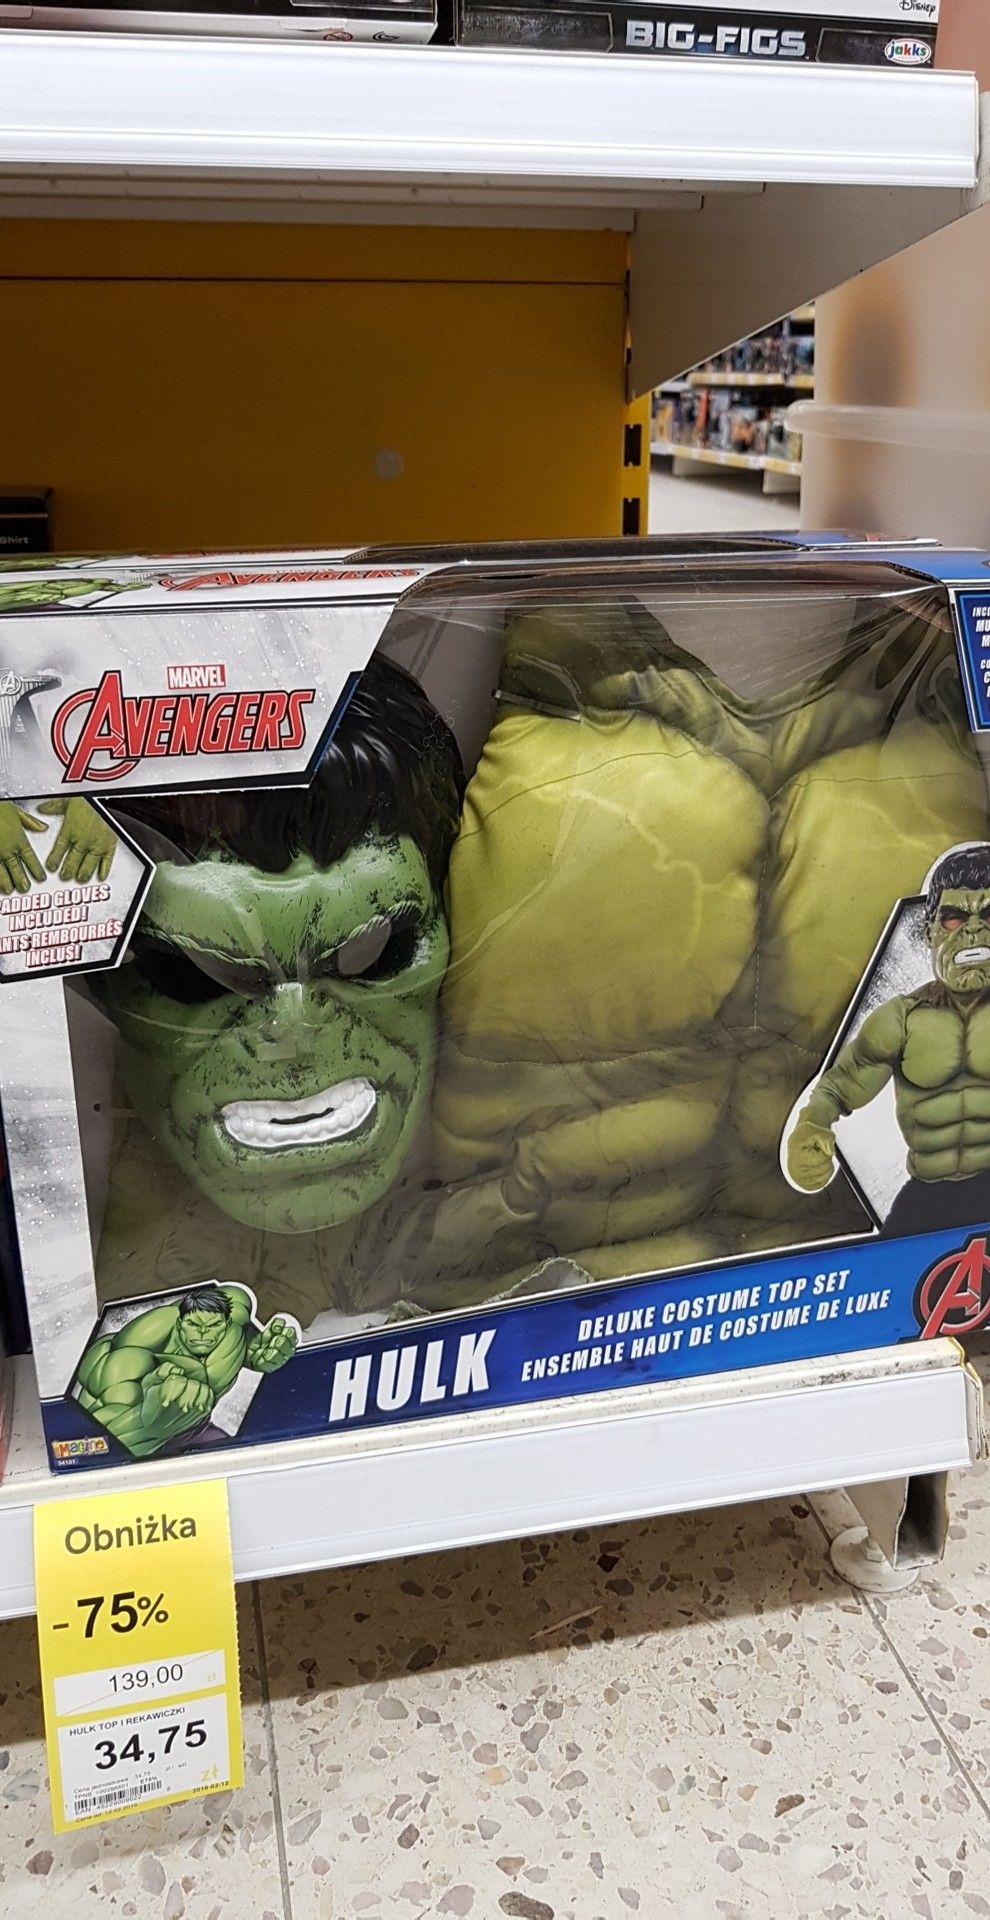 Strój HULK Avengers -75% Tesco